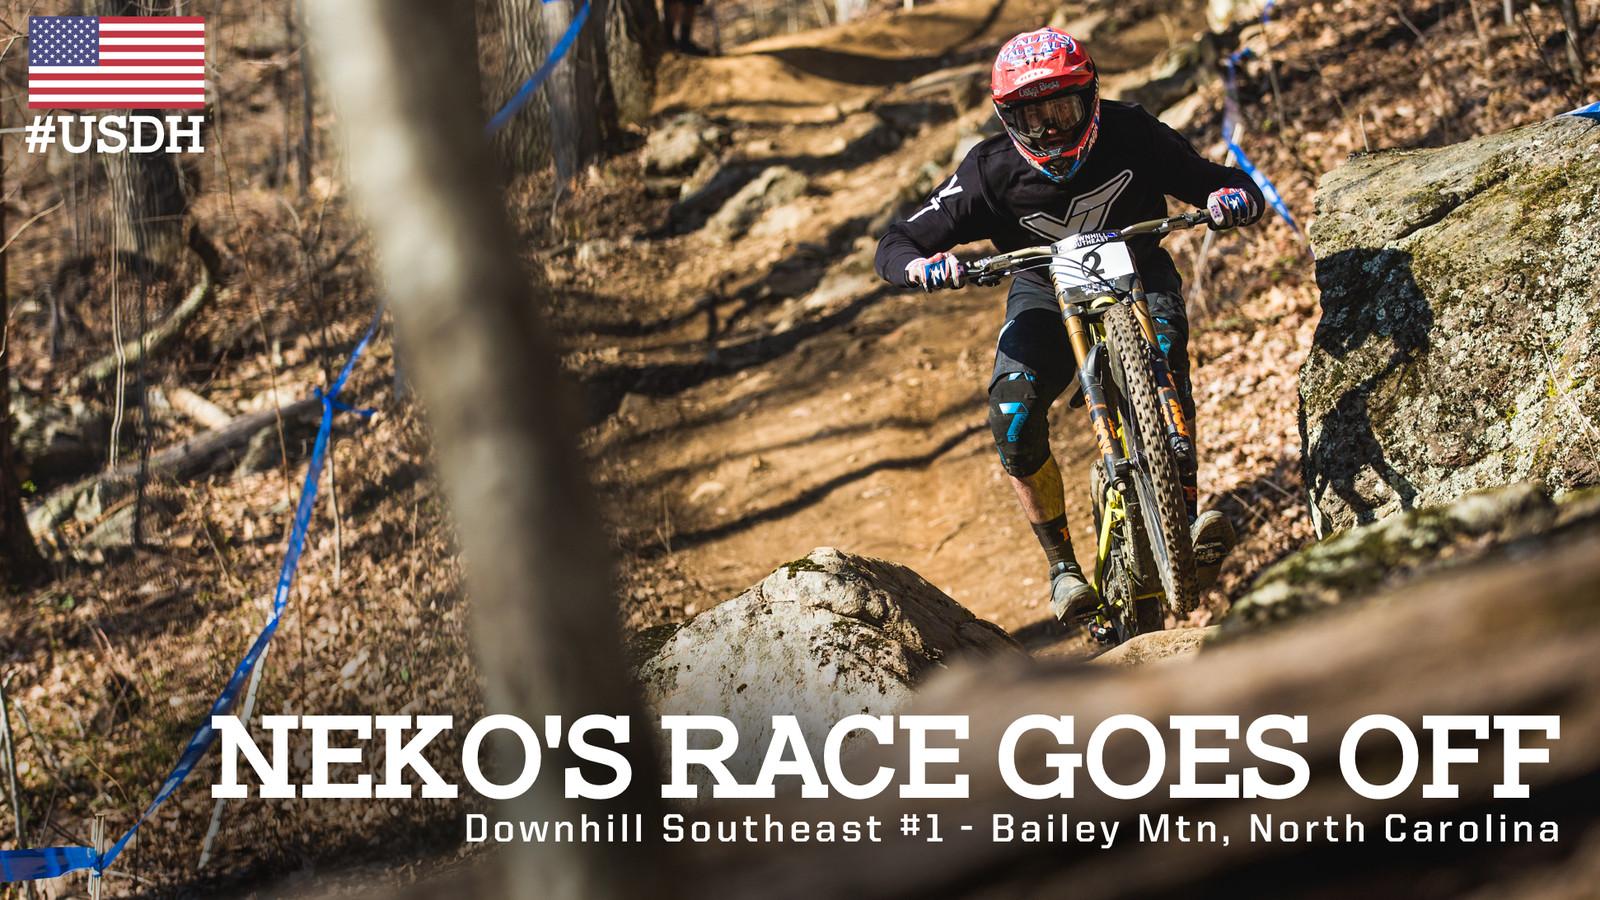 Neko's Race Goes Off - Downhill Southeast at Bailey Mountain